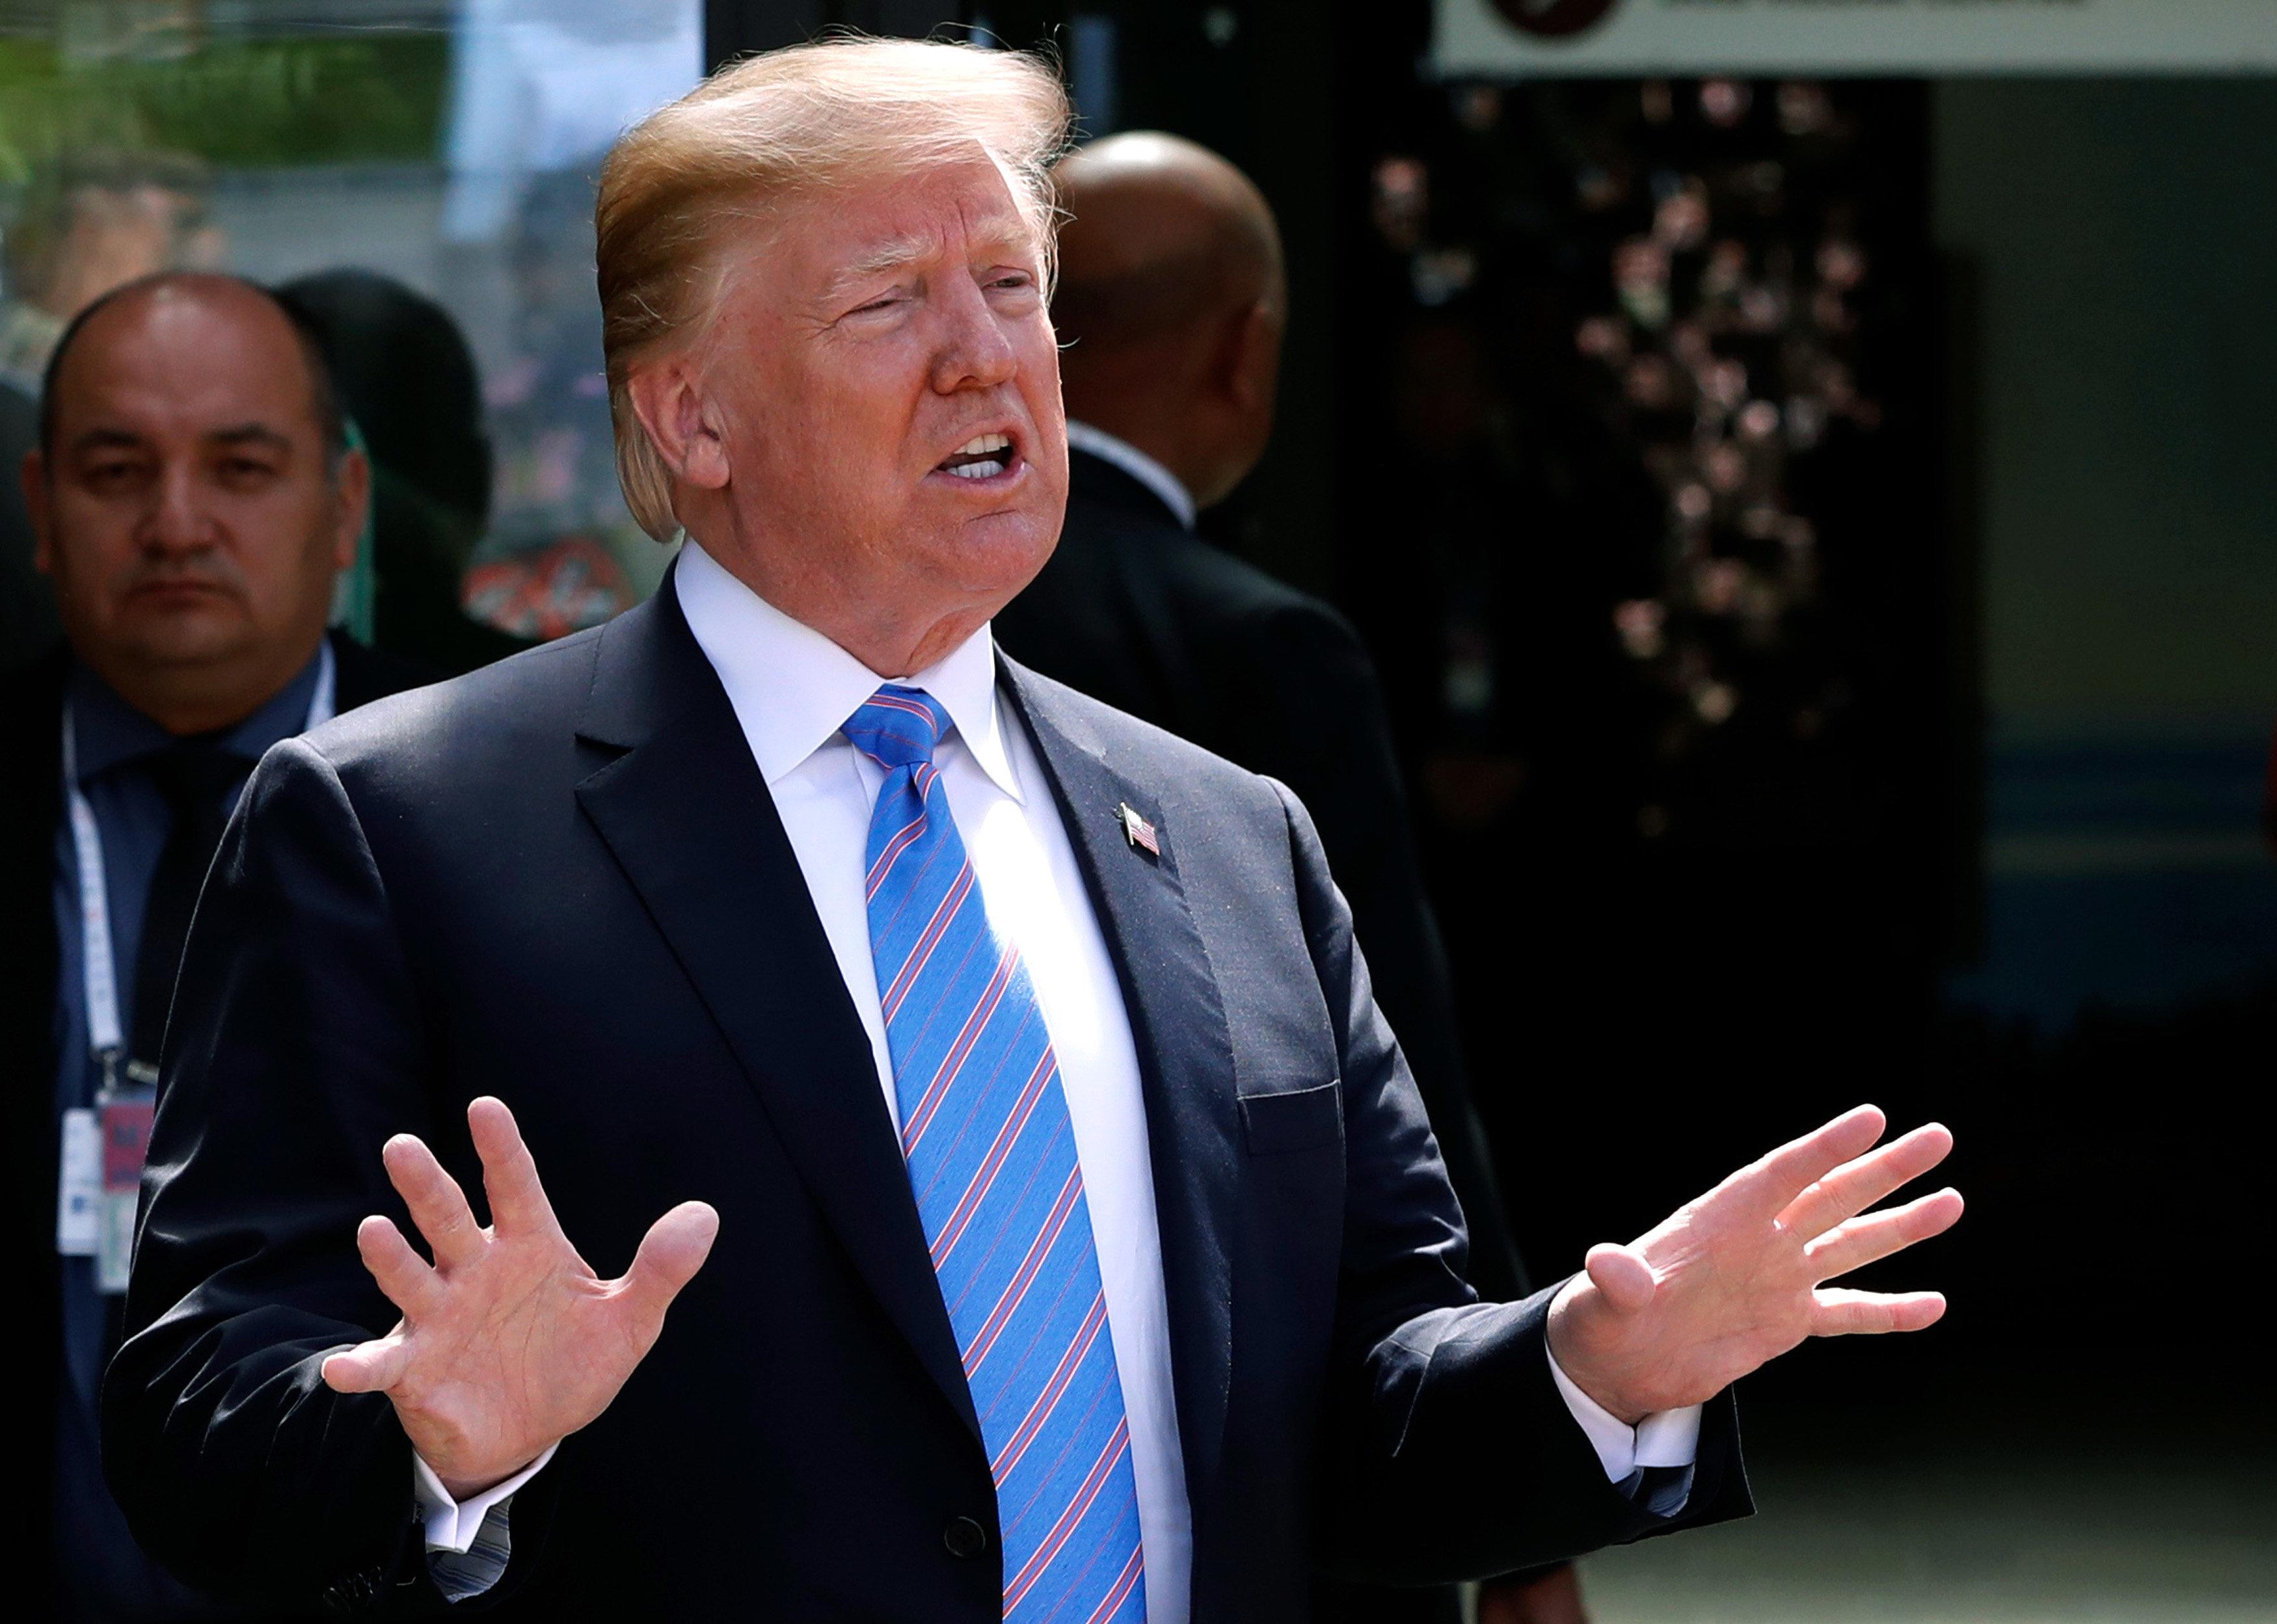 US President Donald Trump has warned the European Union against retaliating against US steel tariffs